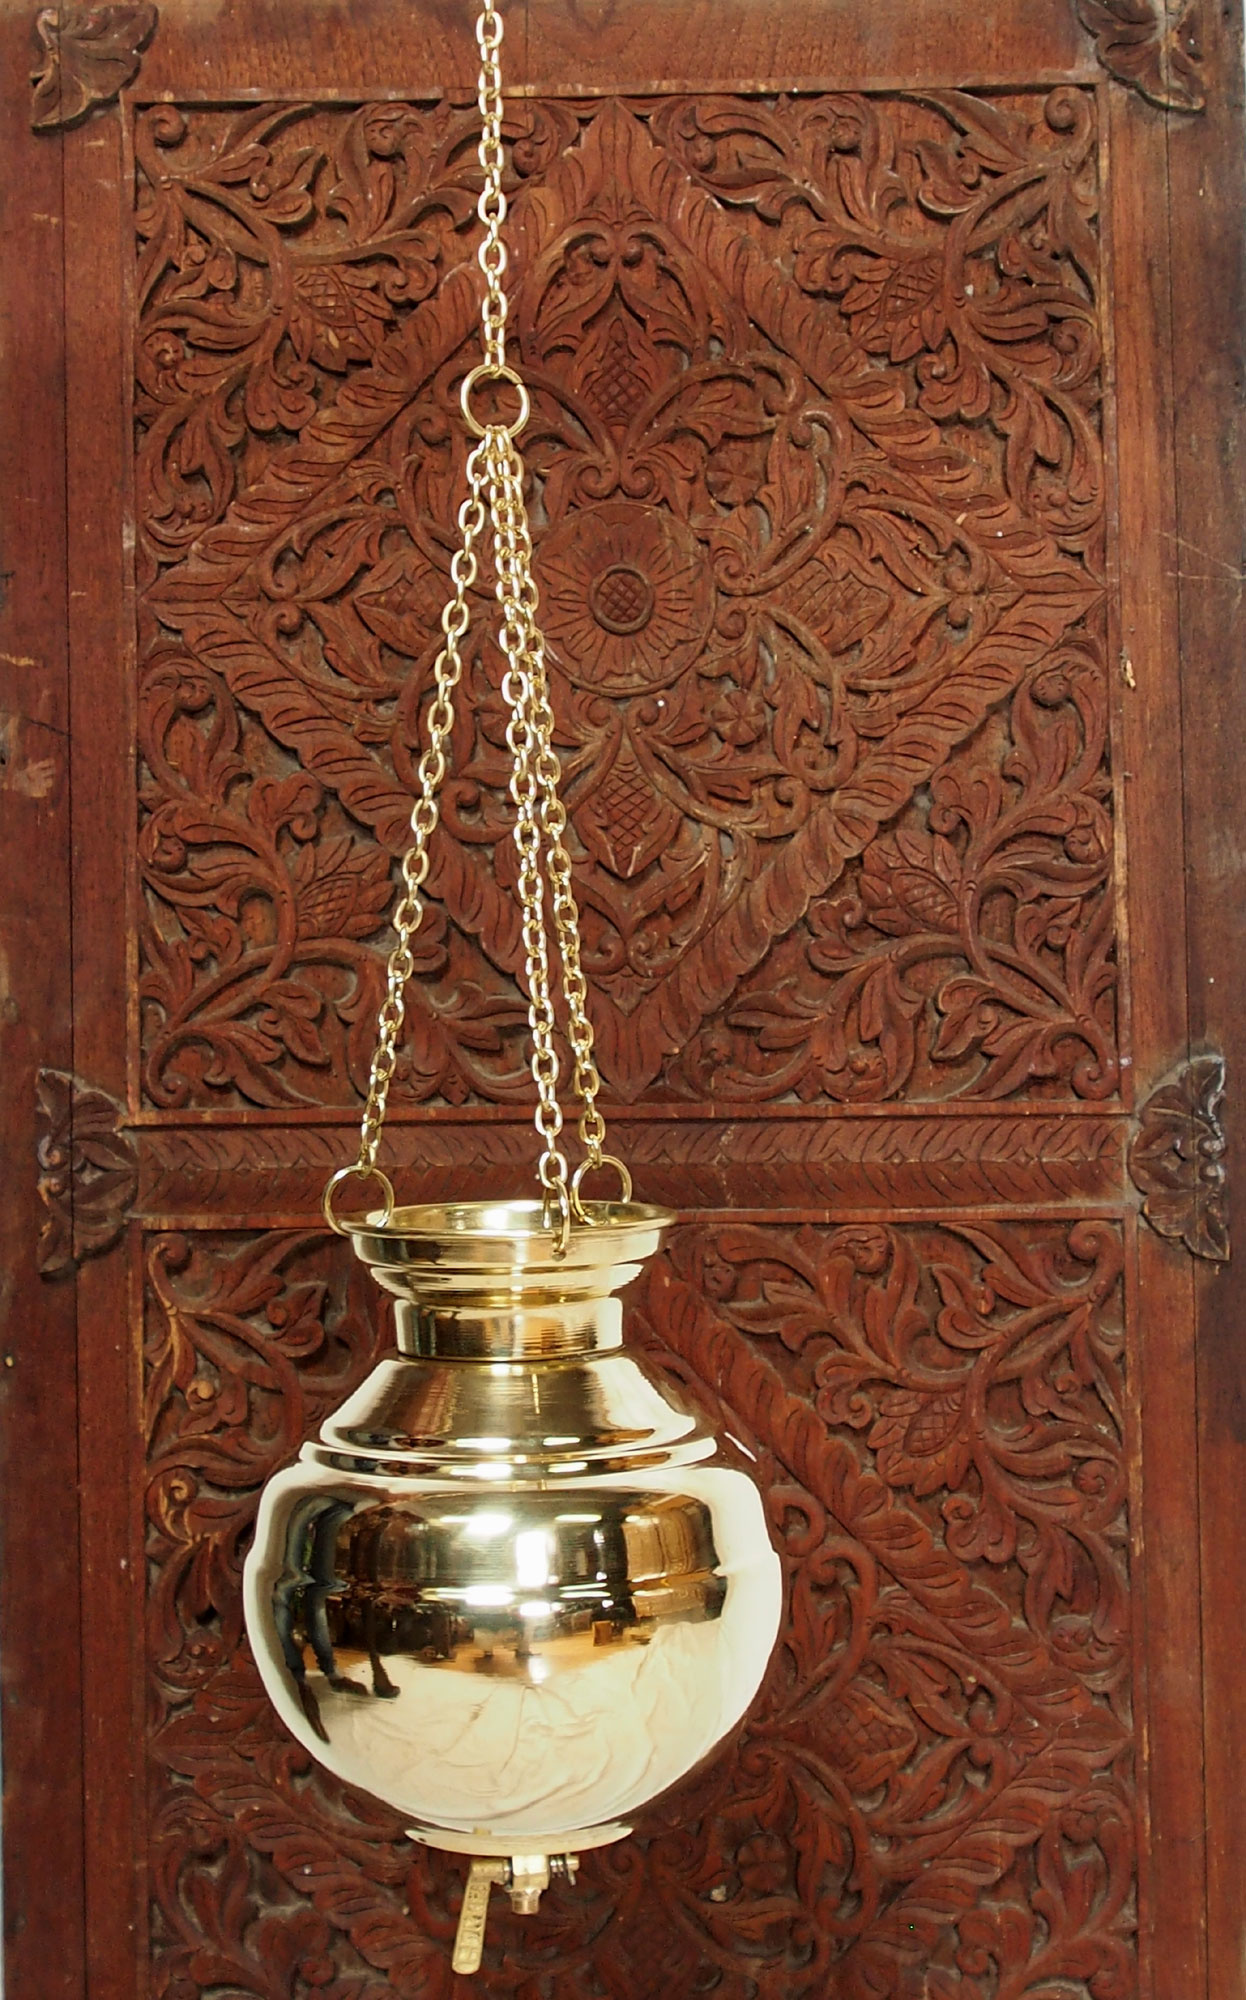 shirodhara ayurveda Stand inklusiv 2.5 Liter Messing Shirodhara Gefäß Nr:19